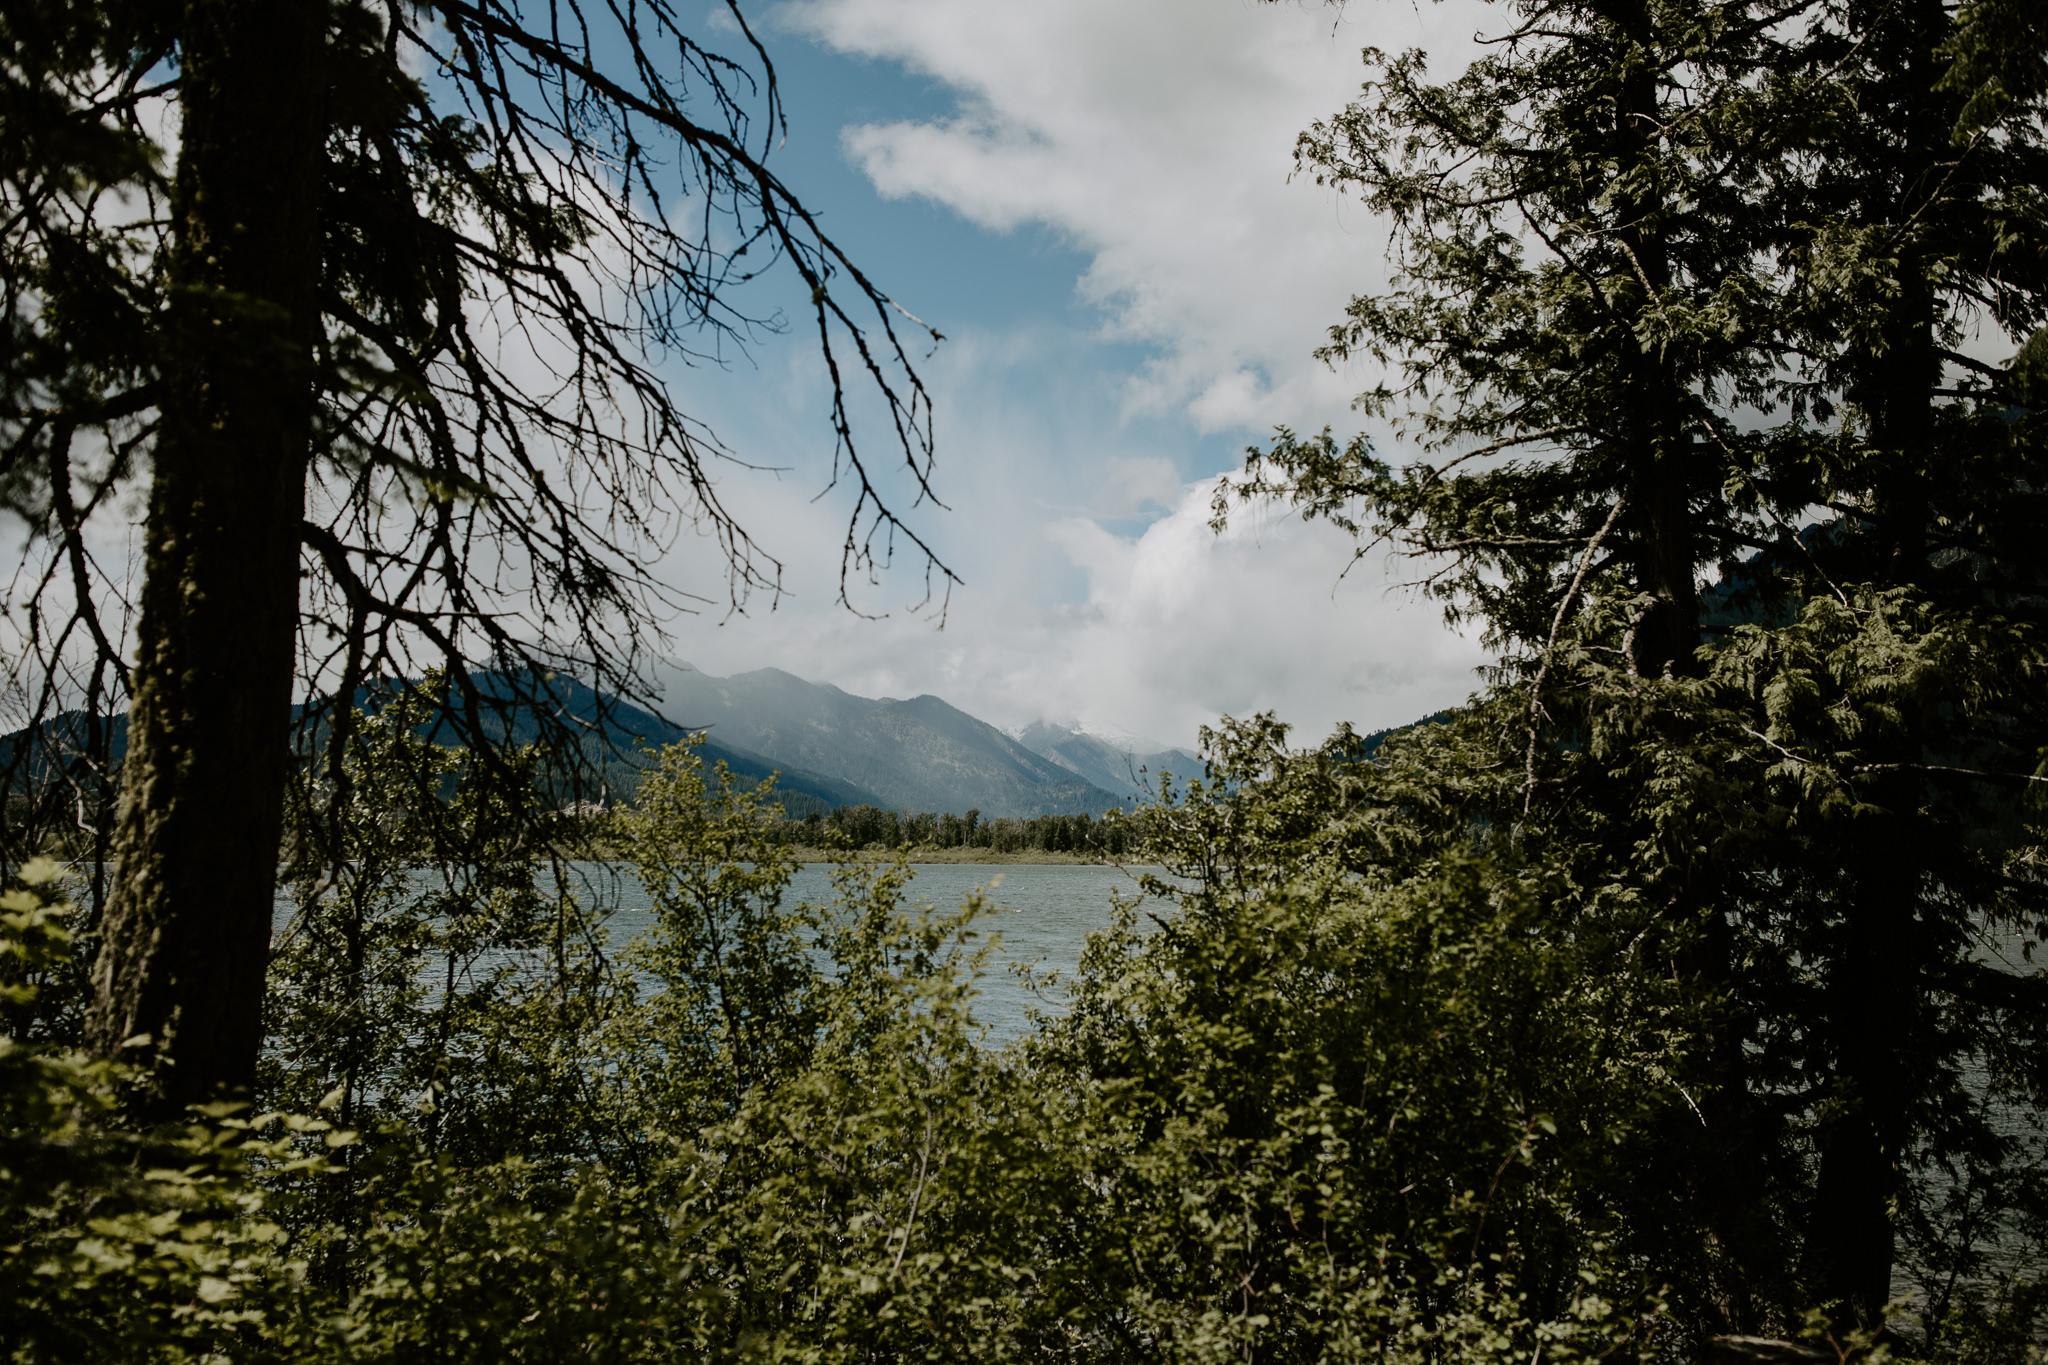 Lake Wenatchee in Wenatchee, Washington